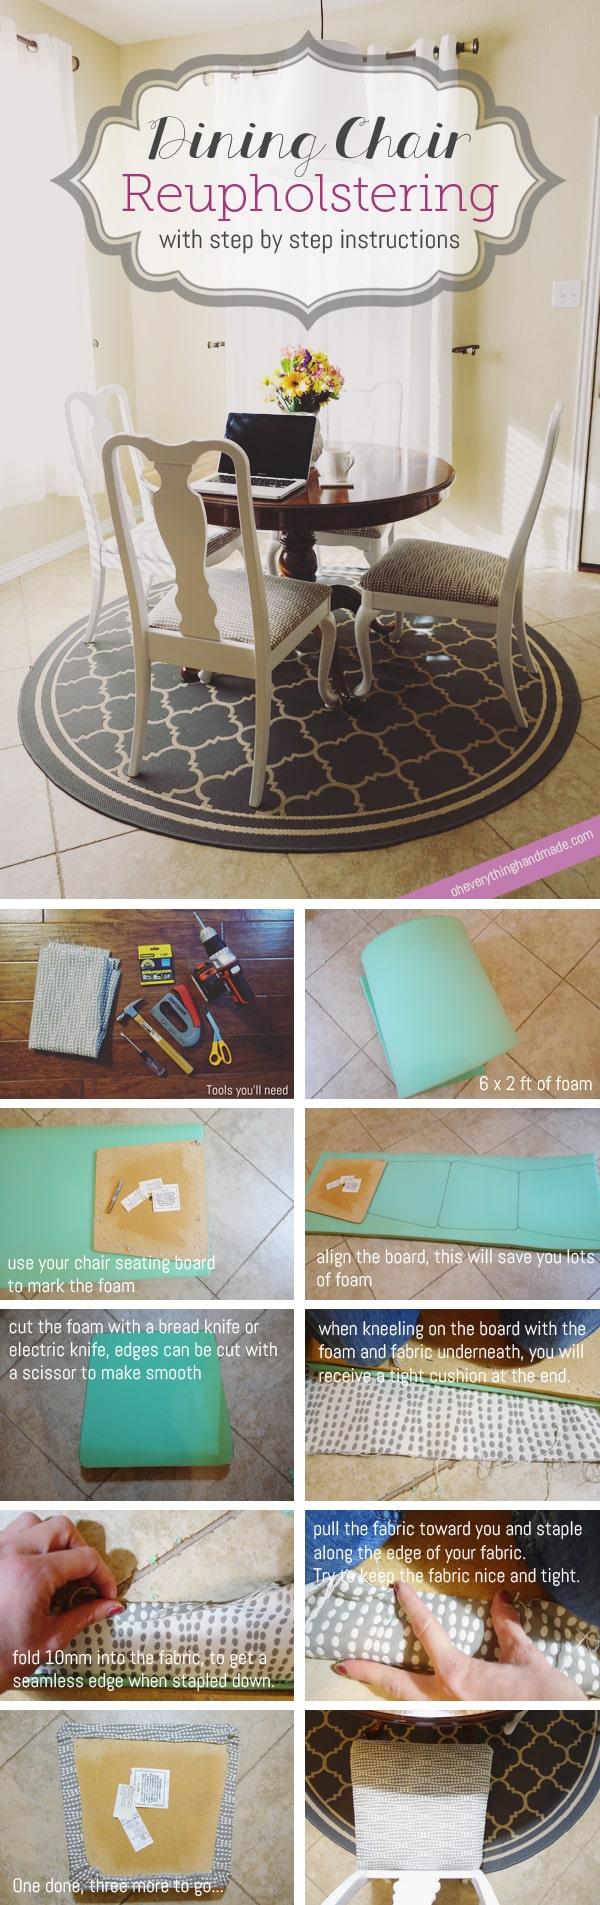 DIY Dining Chair Reupholstering